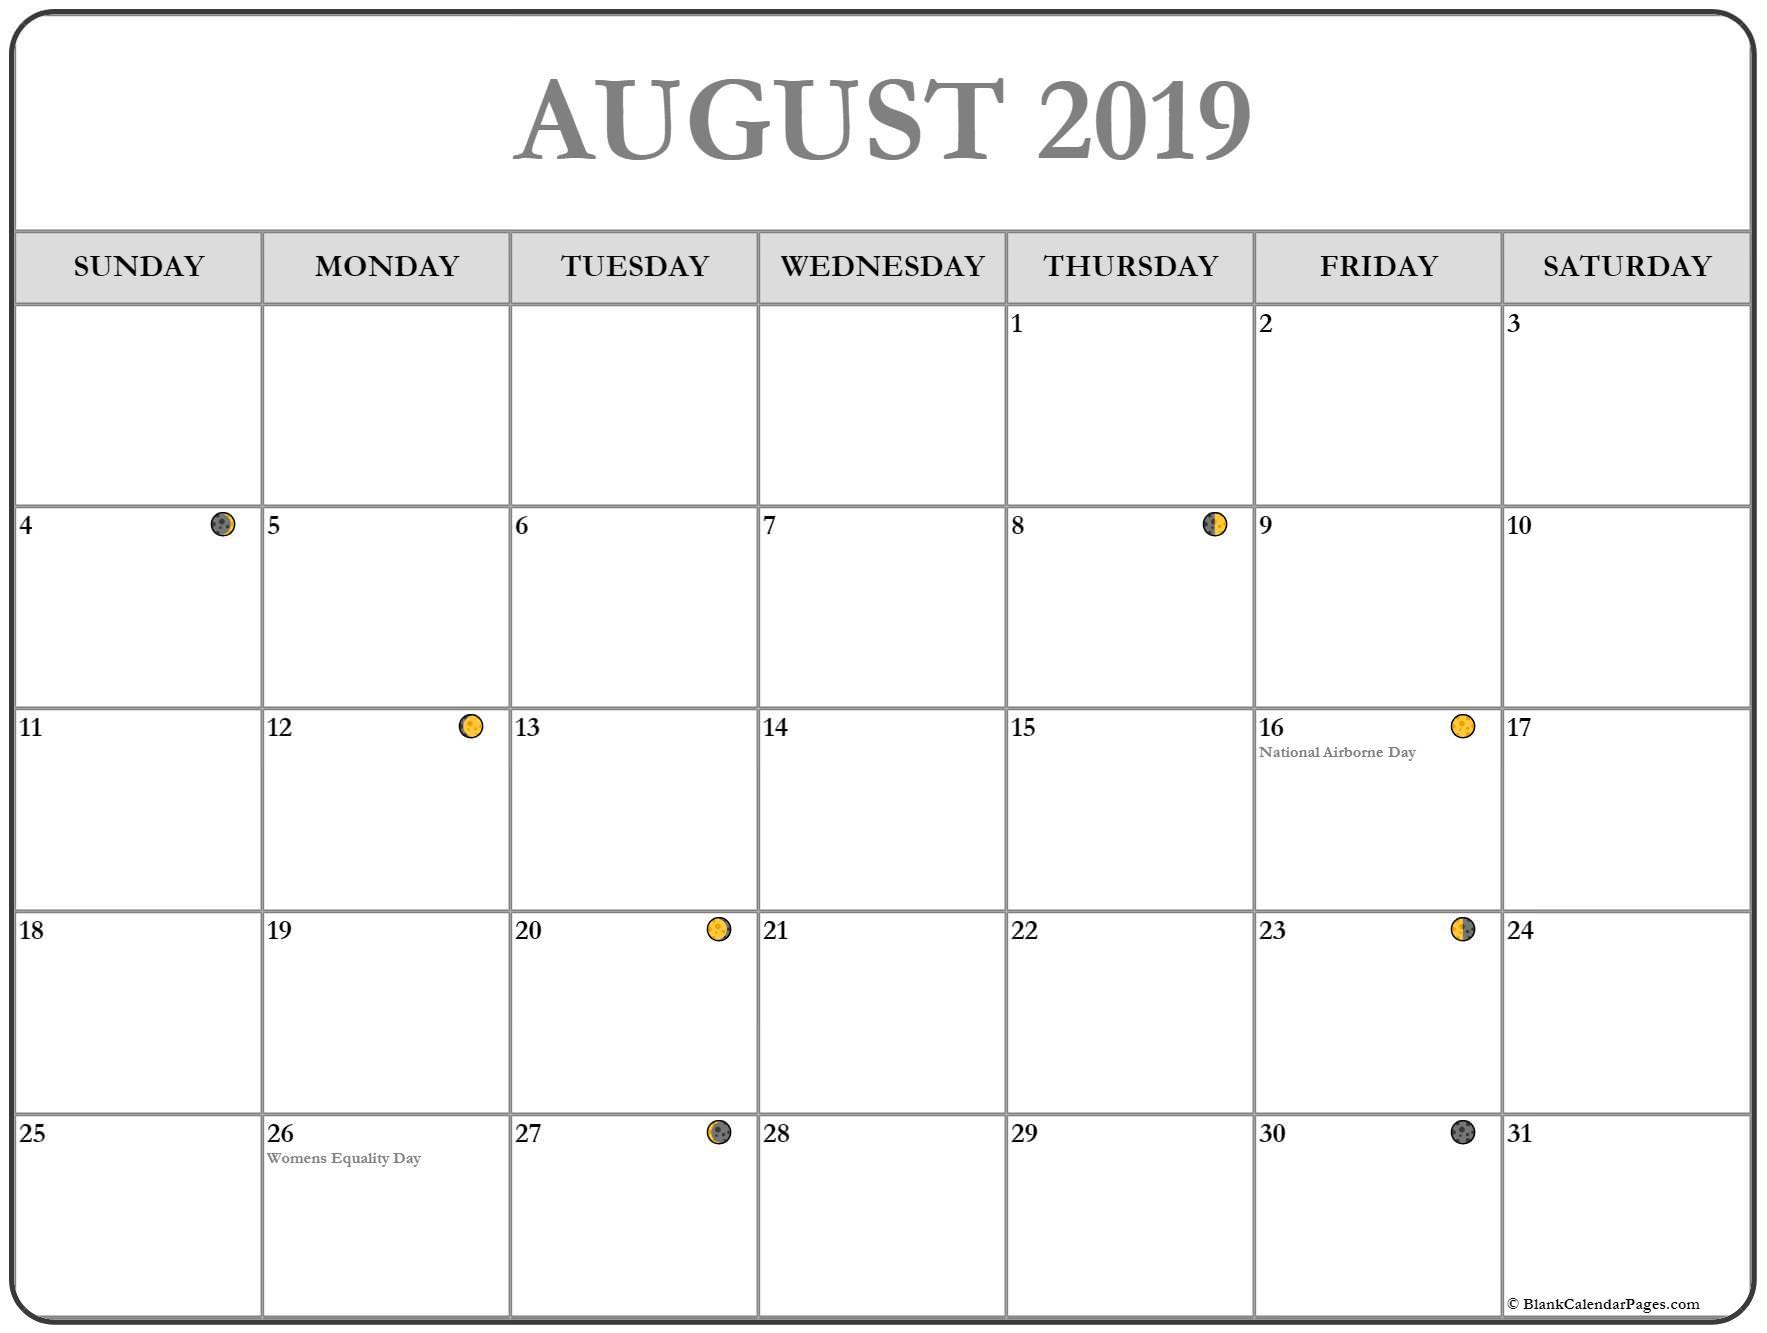 ✅ Blank August 2019 Calendar Printable Free Download inside August Blank Calendar Pages